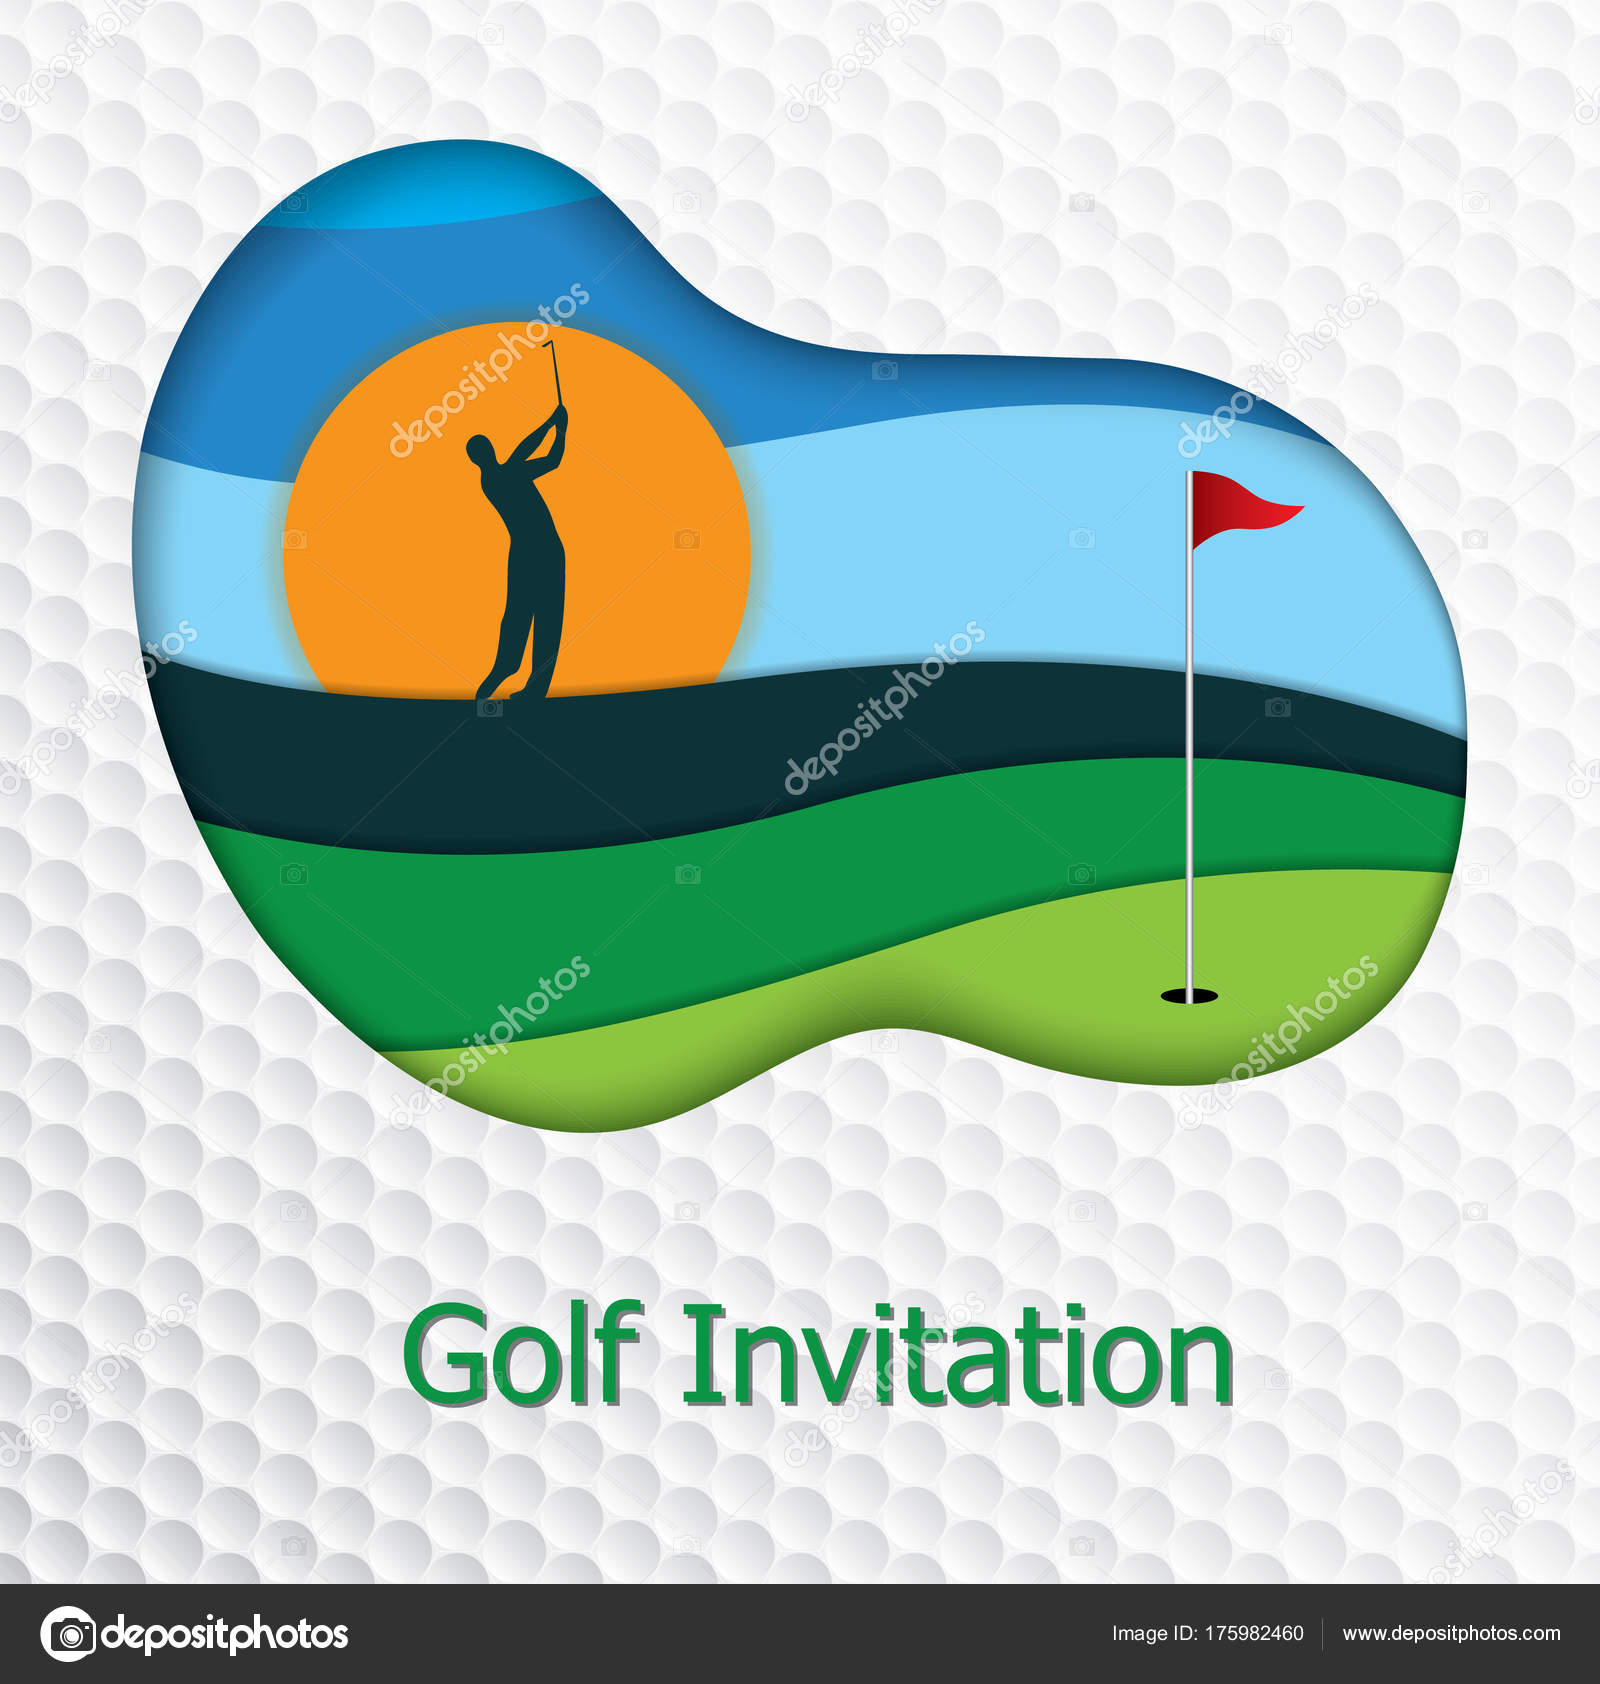 Golf tournament invitation flyer template graphic design golfer golf tournament invitation flyer template graphic design golfer swinging fairway stock vector stopboris Choice Image